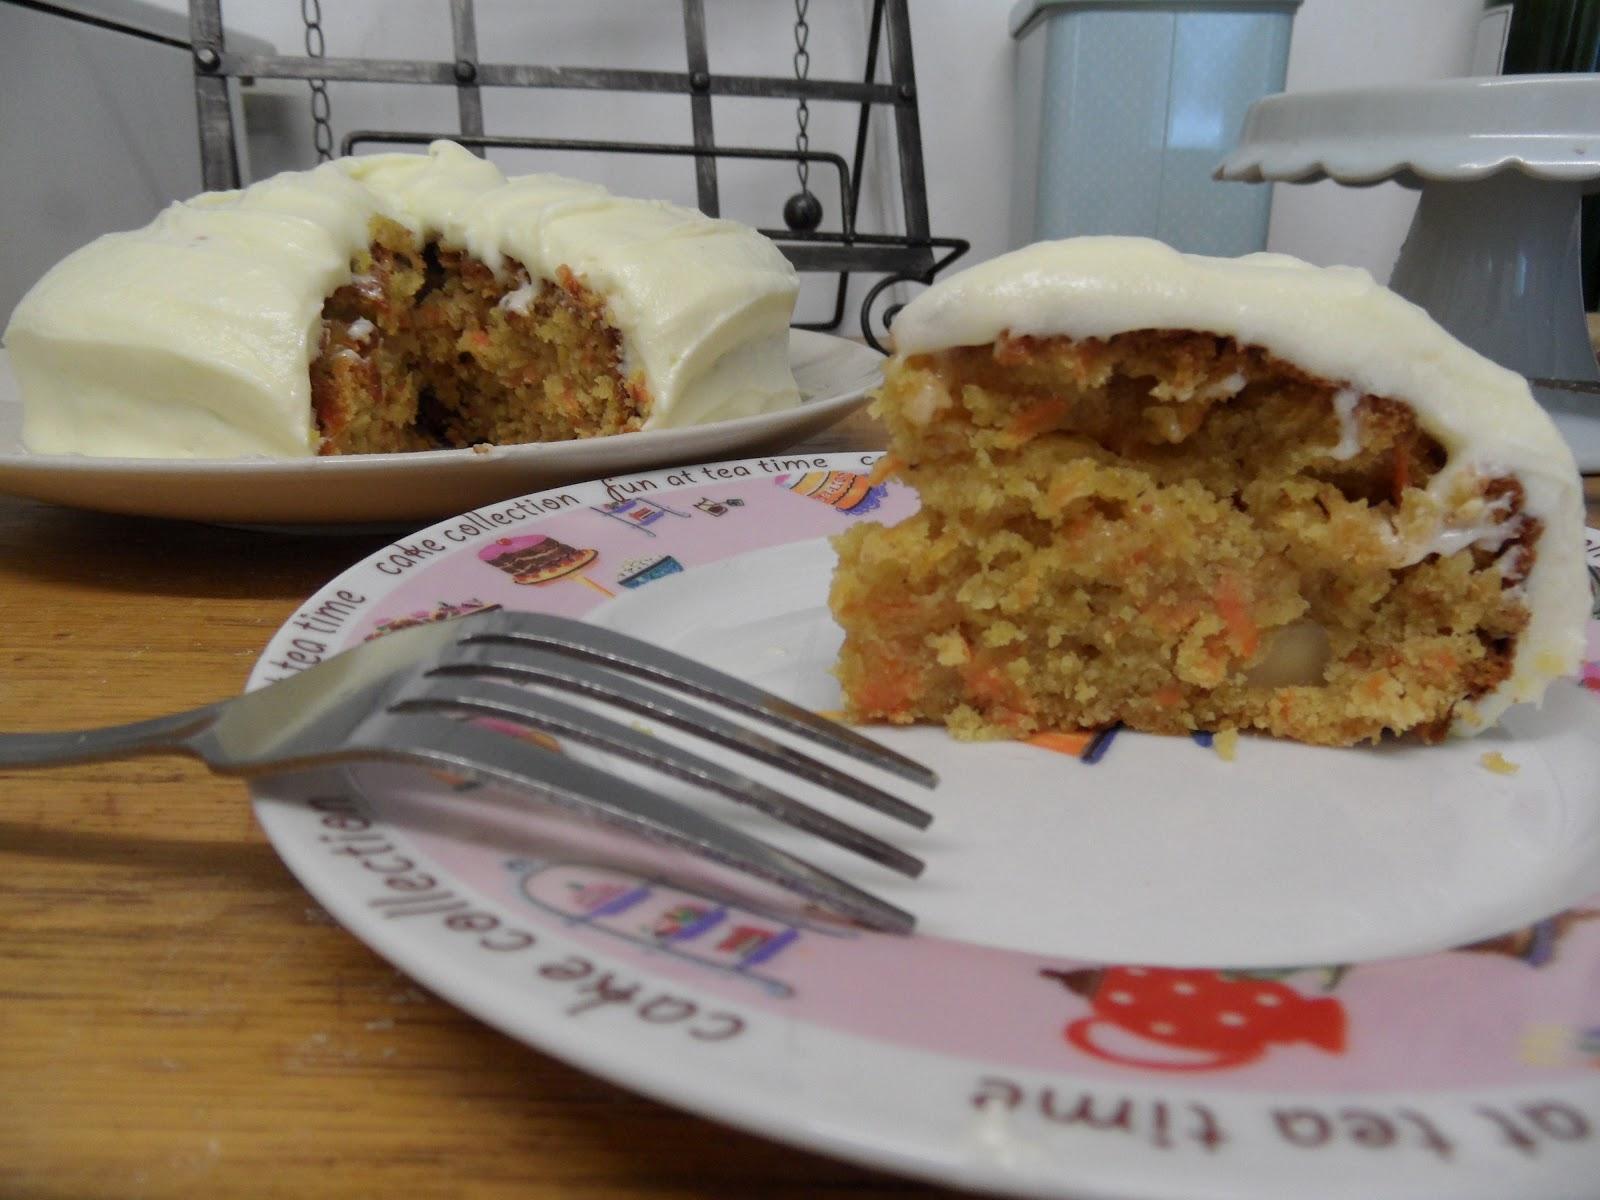 Sam S Club Carrot Cake